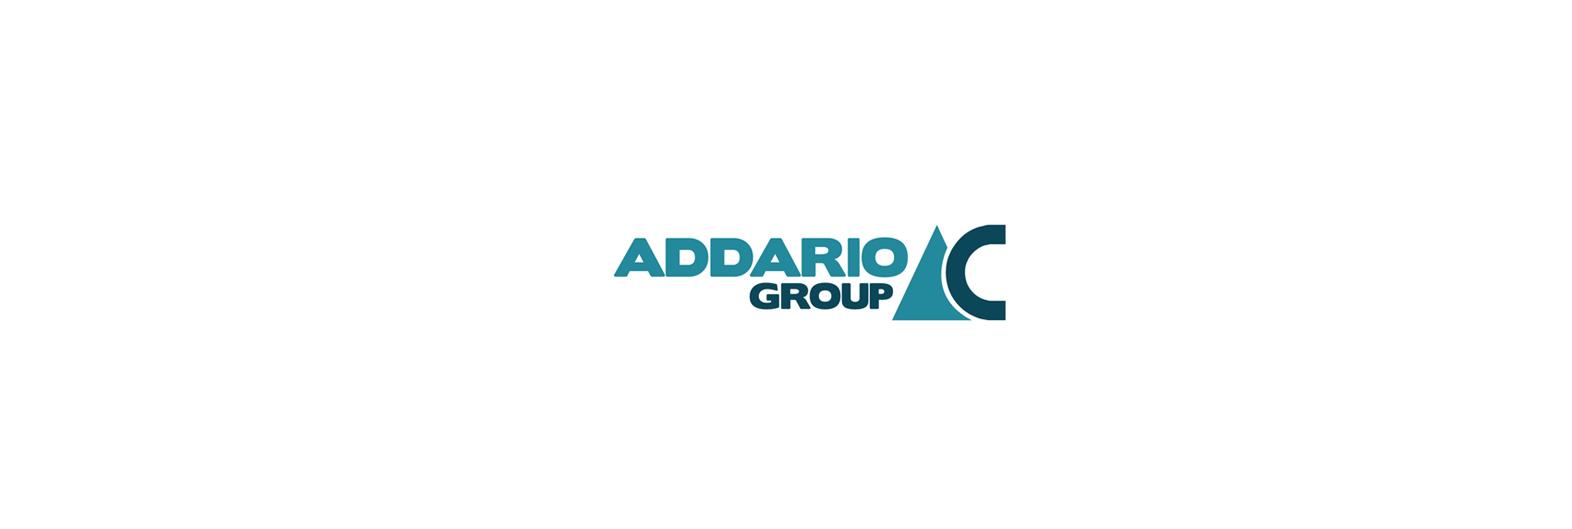 Addario Group: restyling logo e corporate image